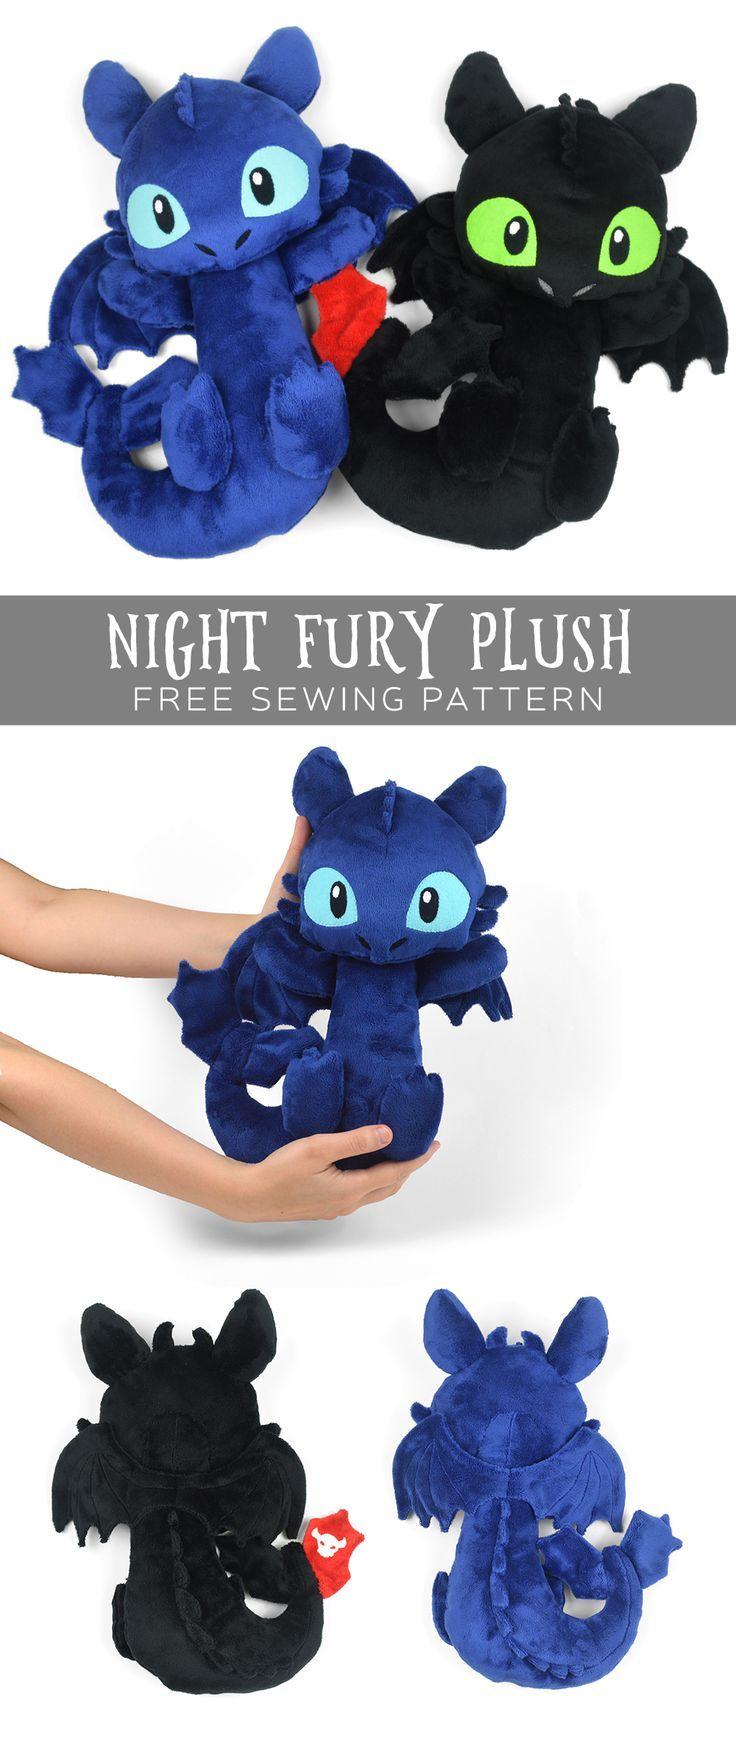 Night fury plush free PDF sewing pattern! | -Step-by-step Sewing ...